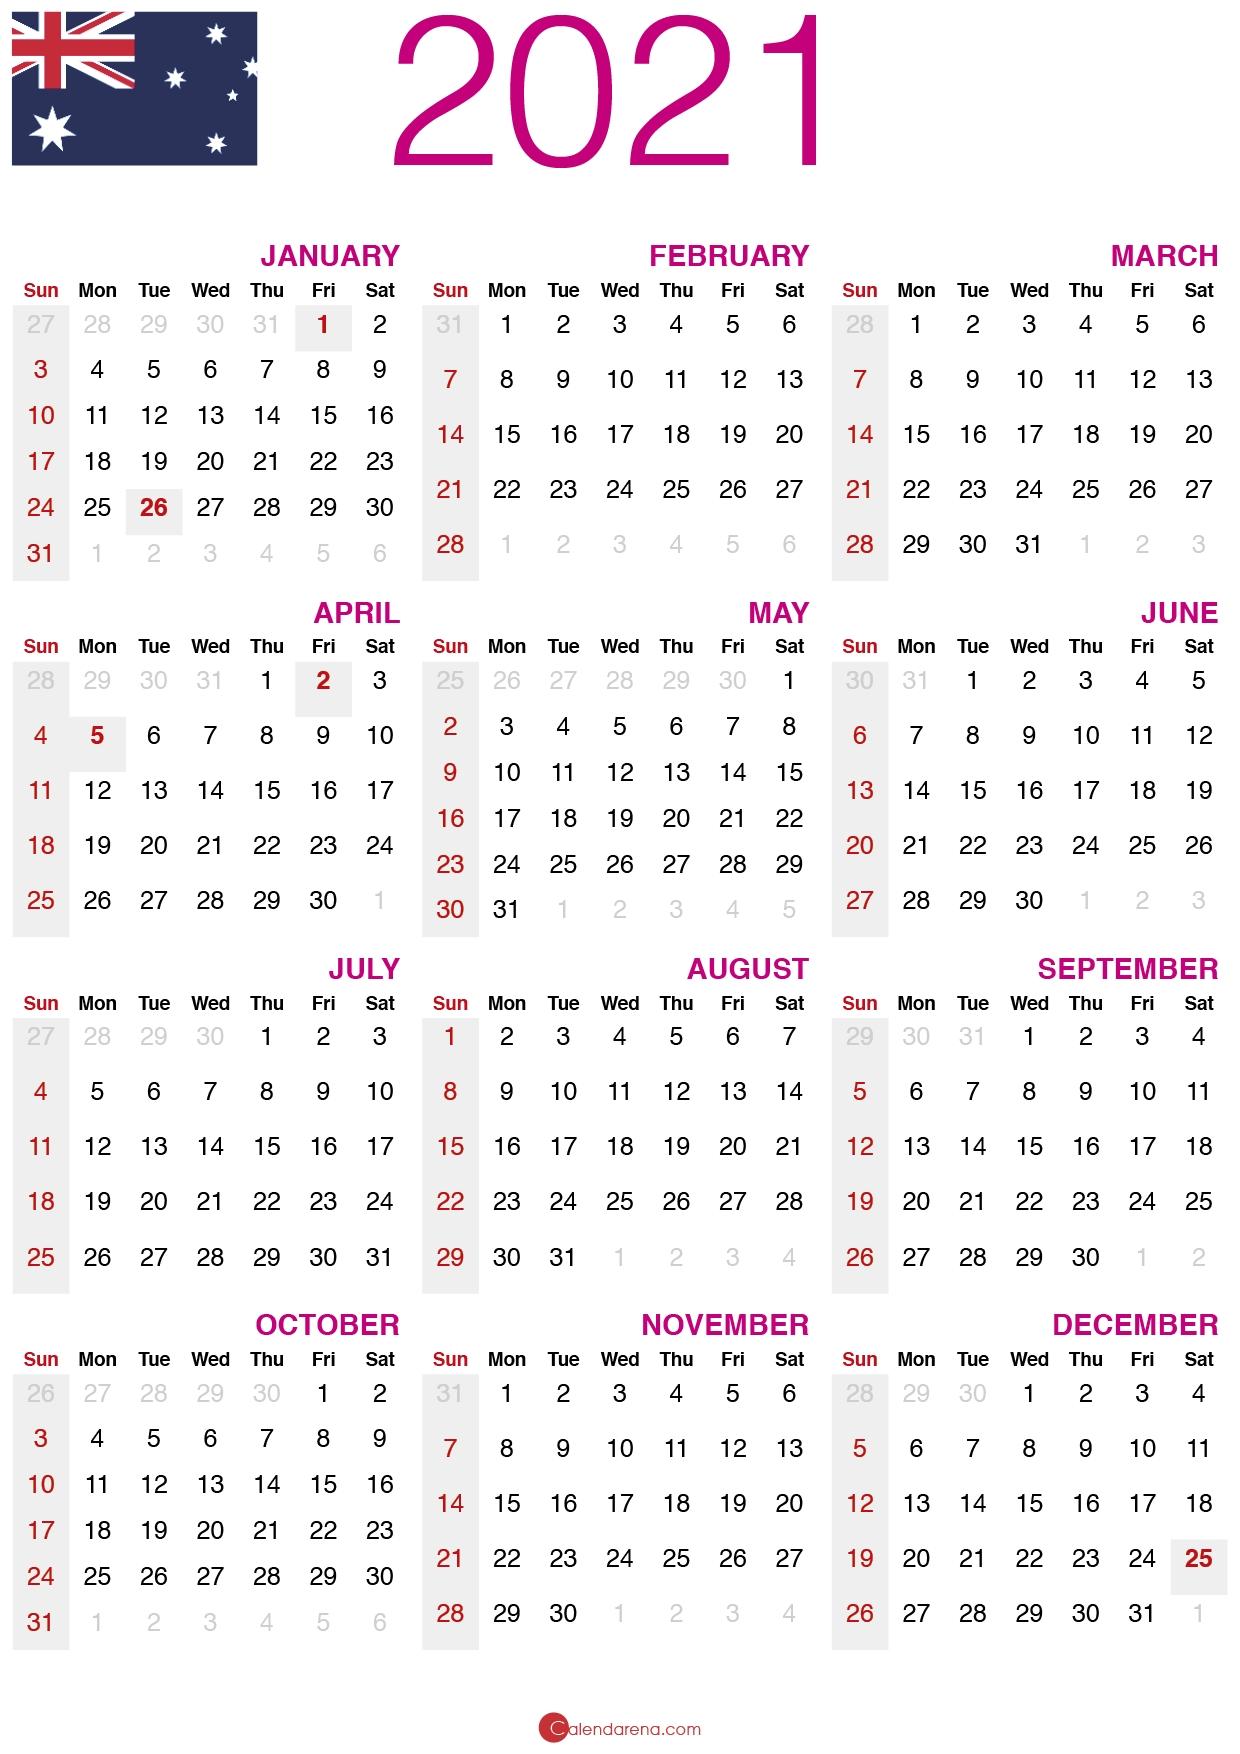 Download Free 2021 Calendar Australia 🇦🇺 Show Me July 2021 Calendar